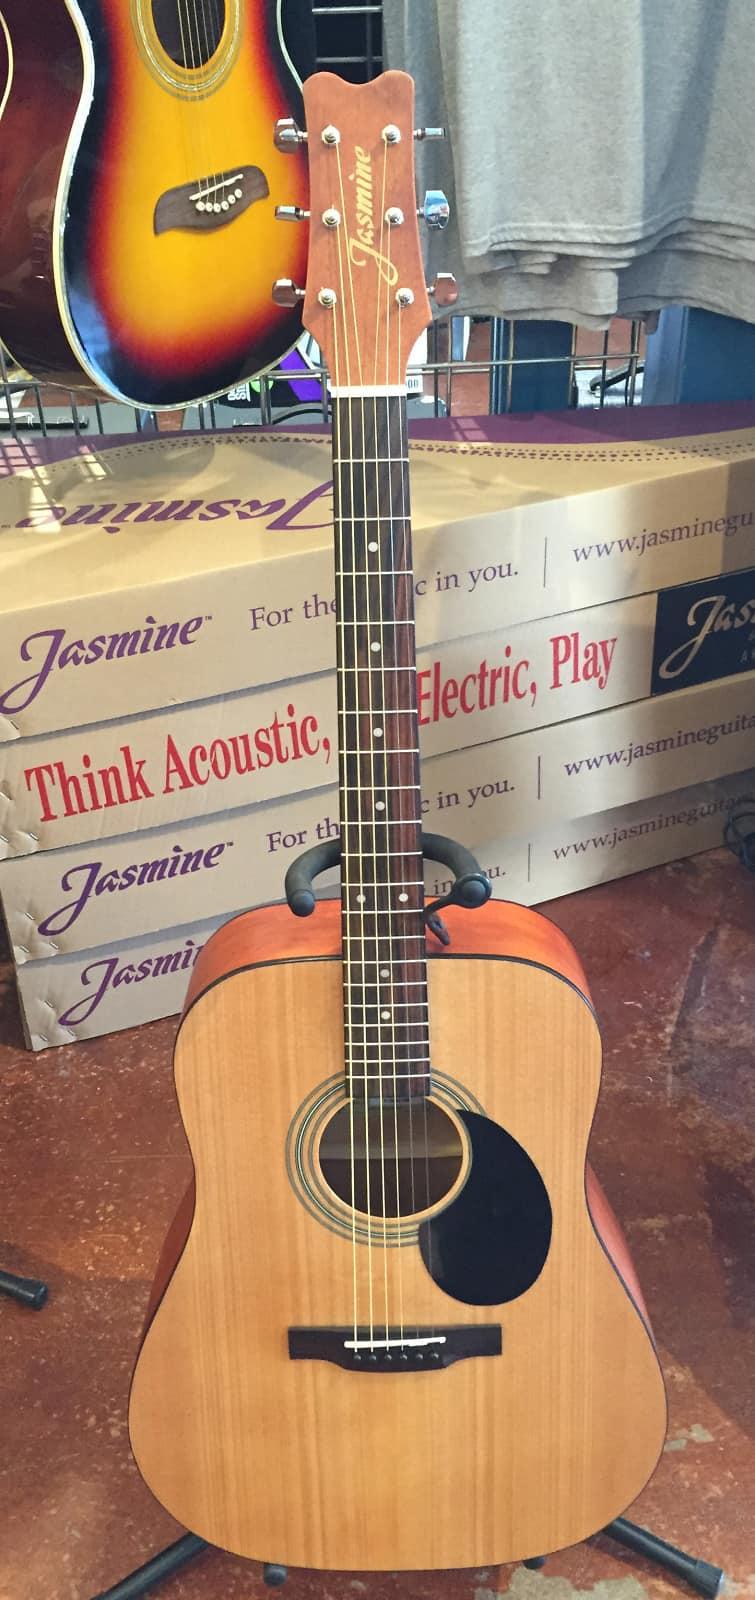 takamine jasmine s35 acoustic guitar brand new reverb. Black Bedroom Furniture Sets. Home Design Ideas